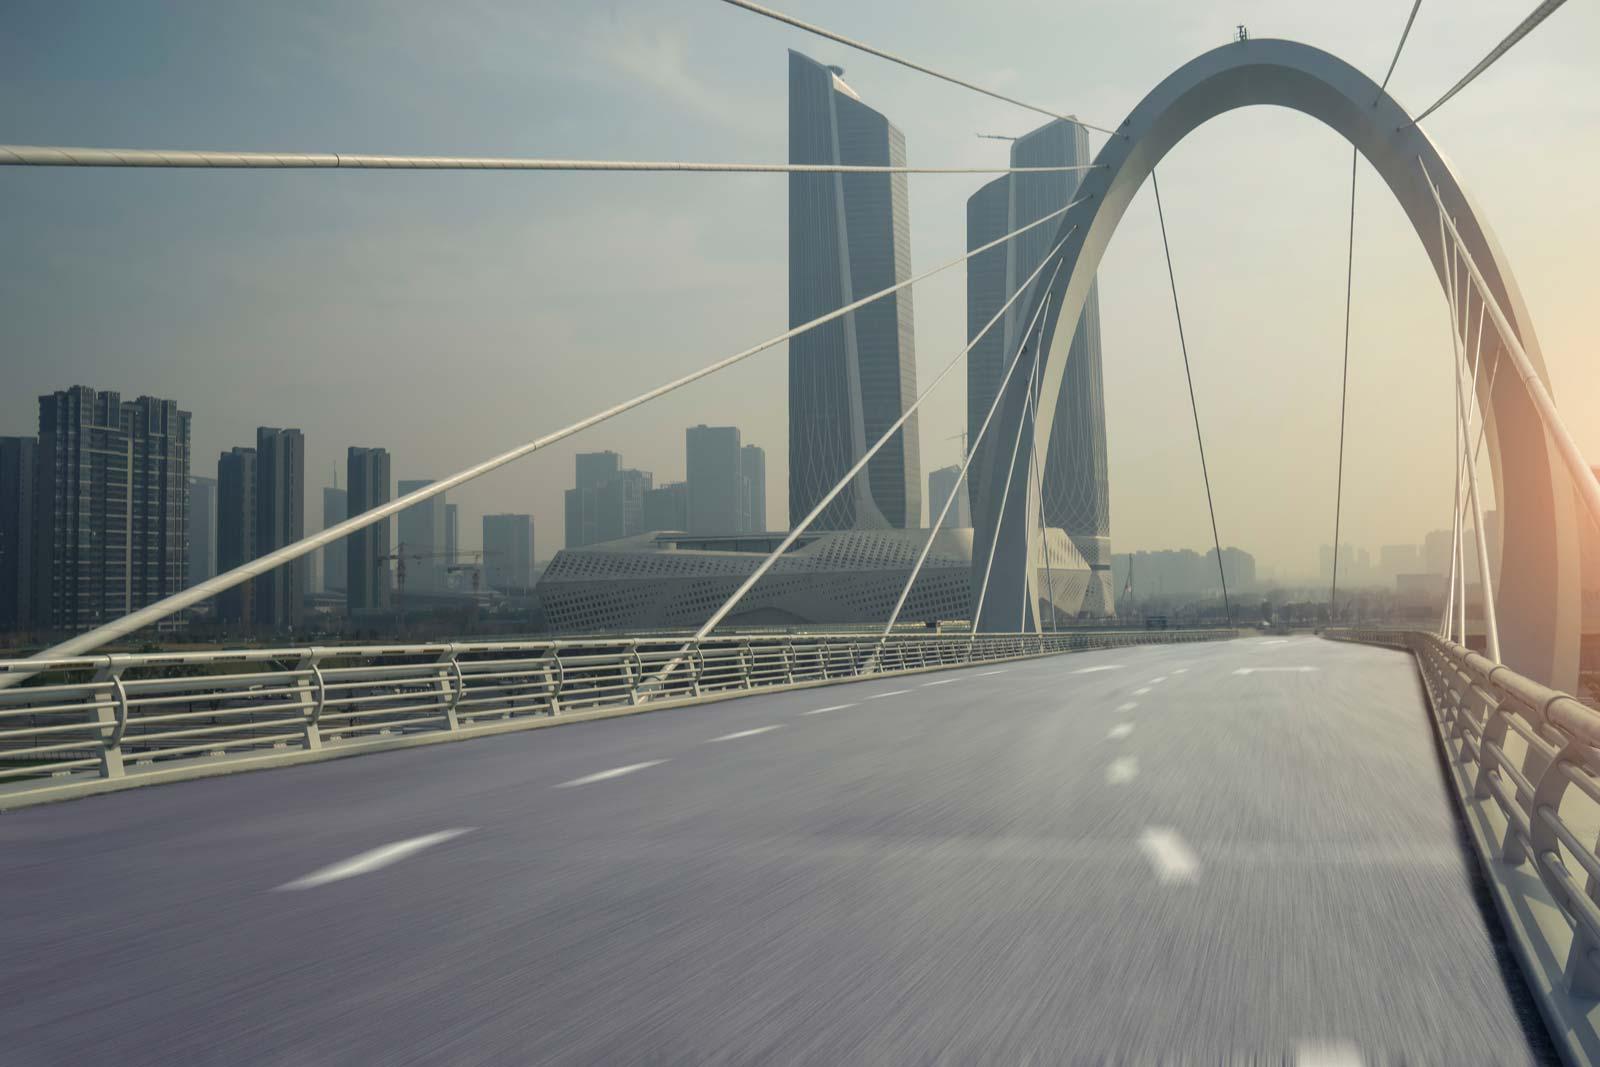 Steel bridge fabricators